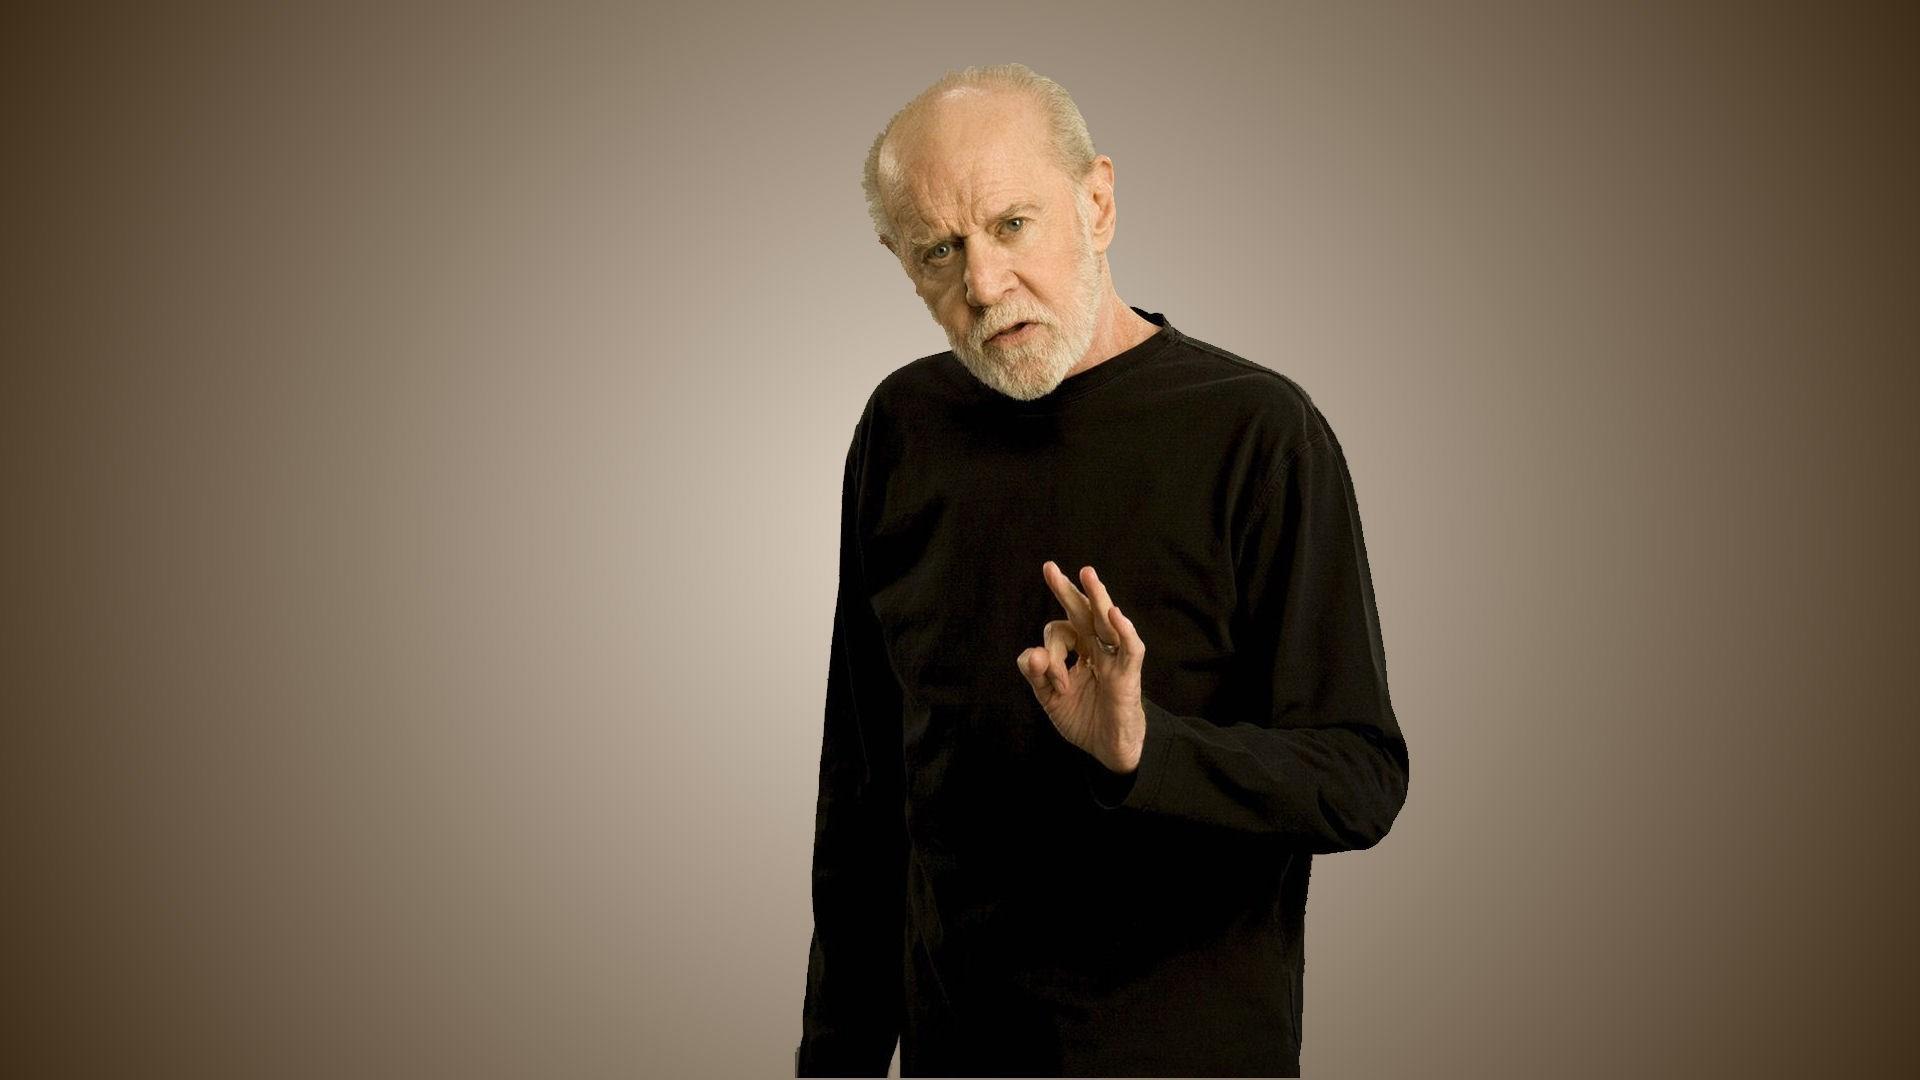 George-carlin-Its-bad-for-ya